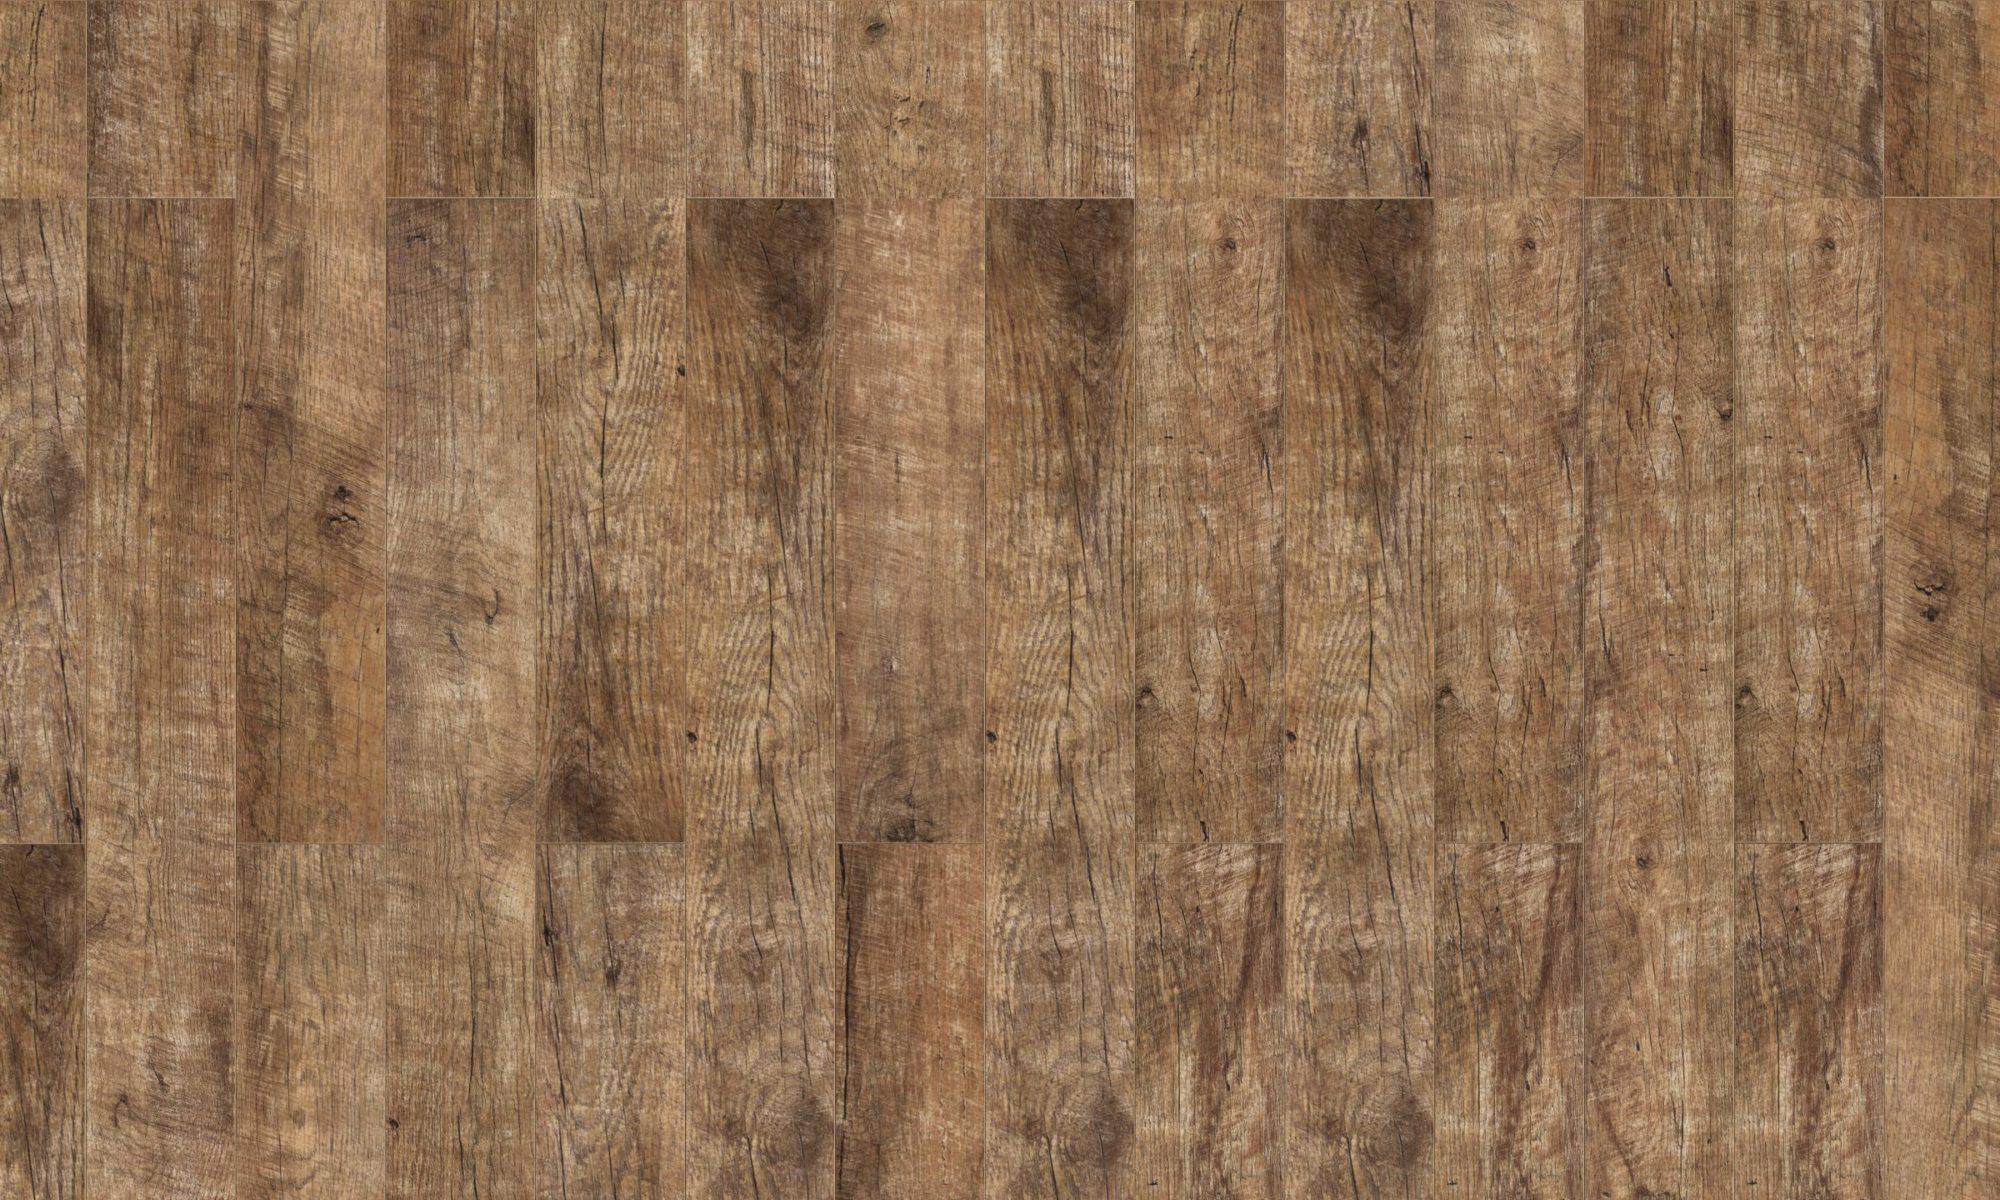 43813 Дъб Valley   Groove narrow 8mm AC4 – K2 Floorings – подови настилки